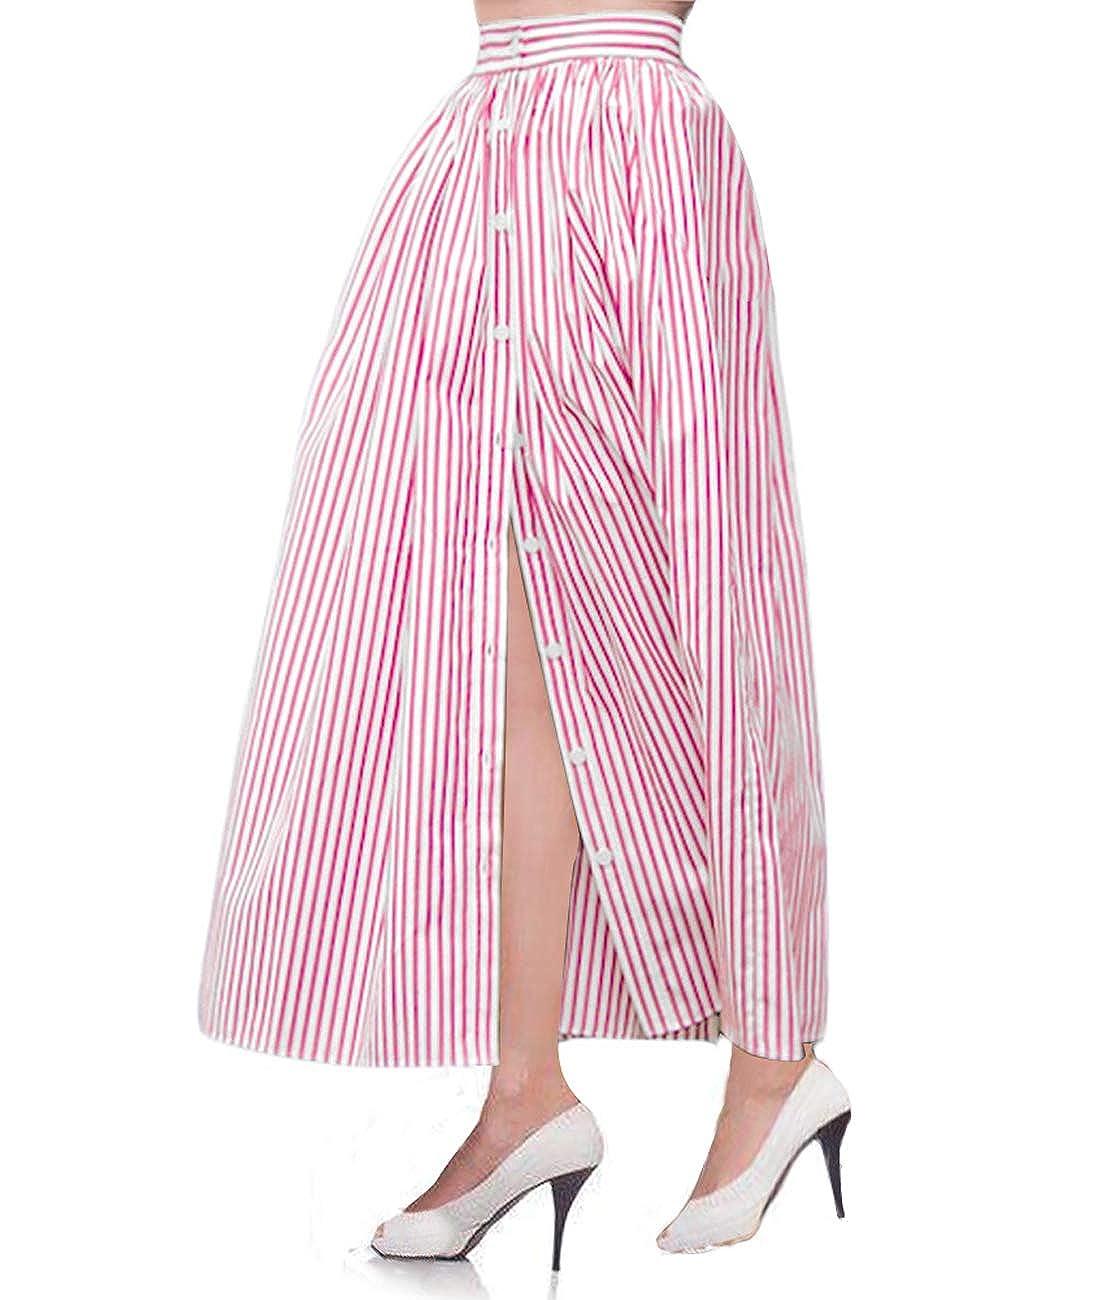 Victorian Skirts | Bustle, Walking, Edwardian Skirts Lalagen Womens Striped Front Slit Ankle Length Button Front High Waist Maxi Skirt $22.99 AT vintagedancer.com